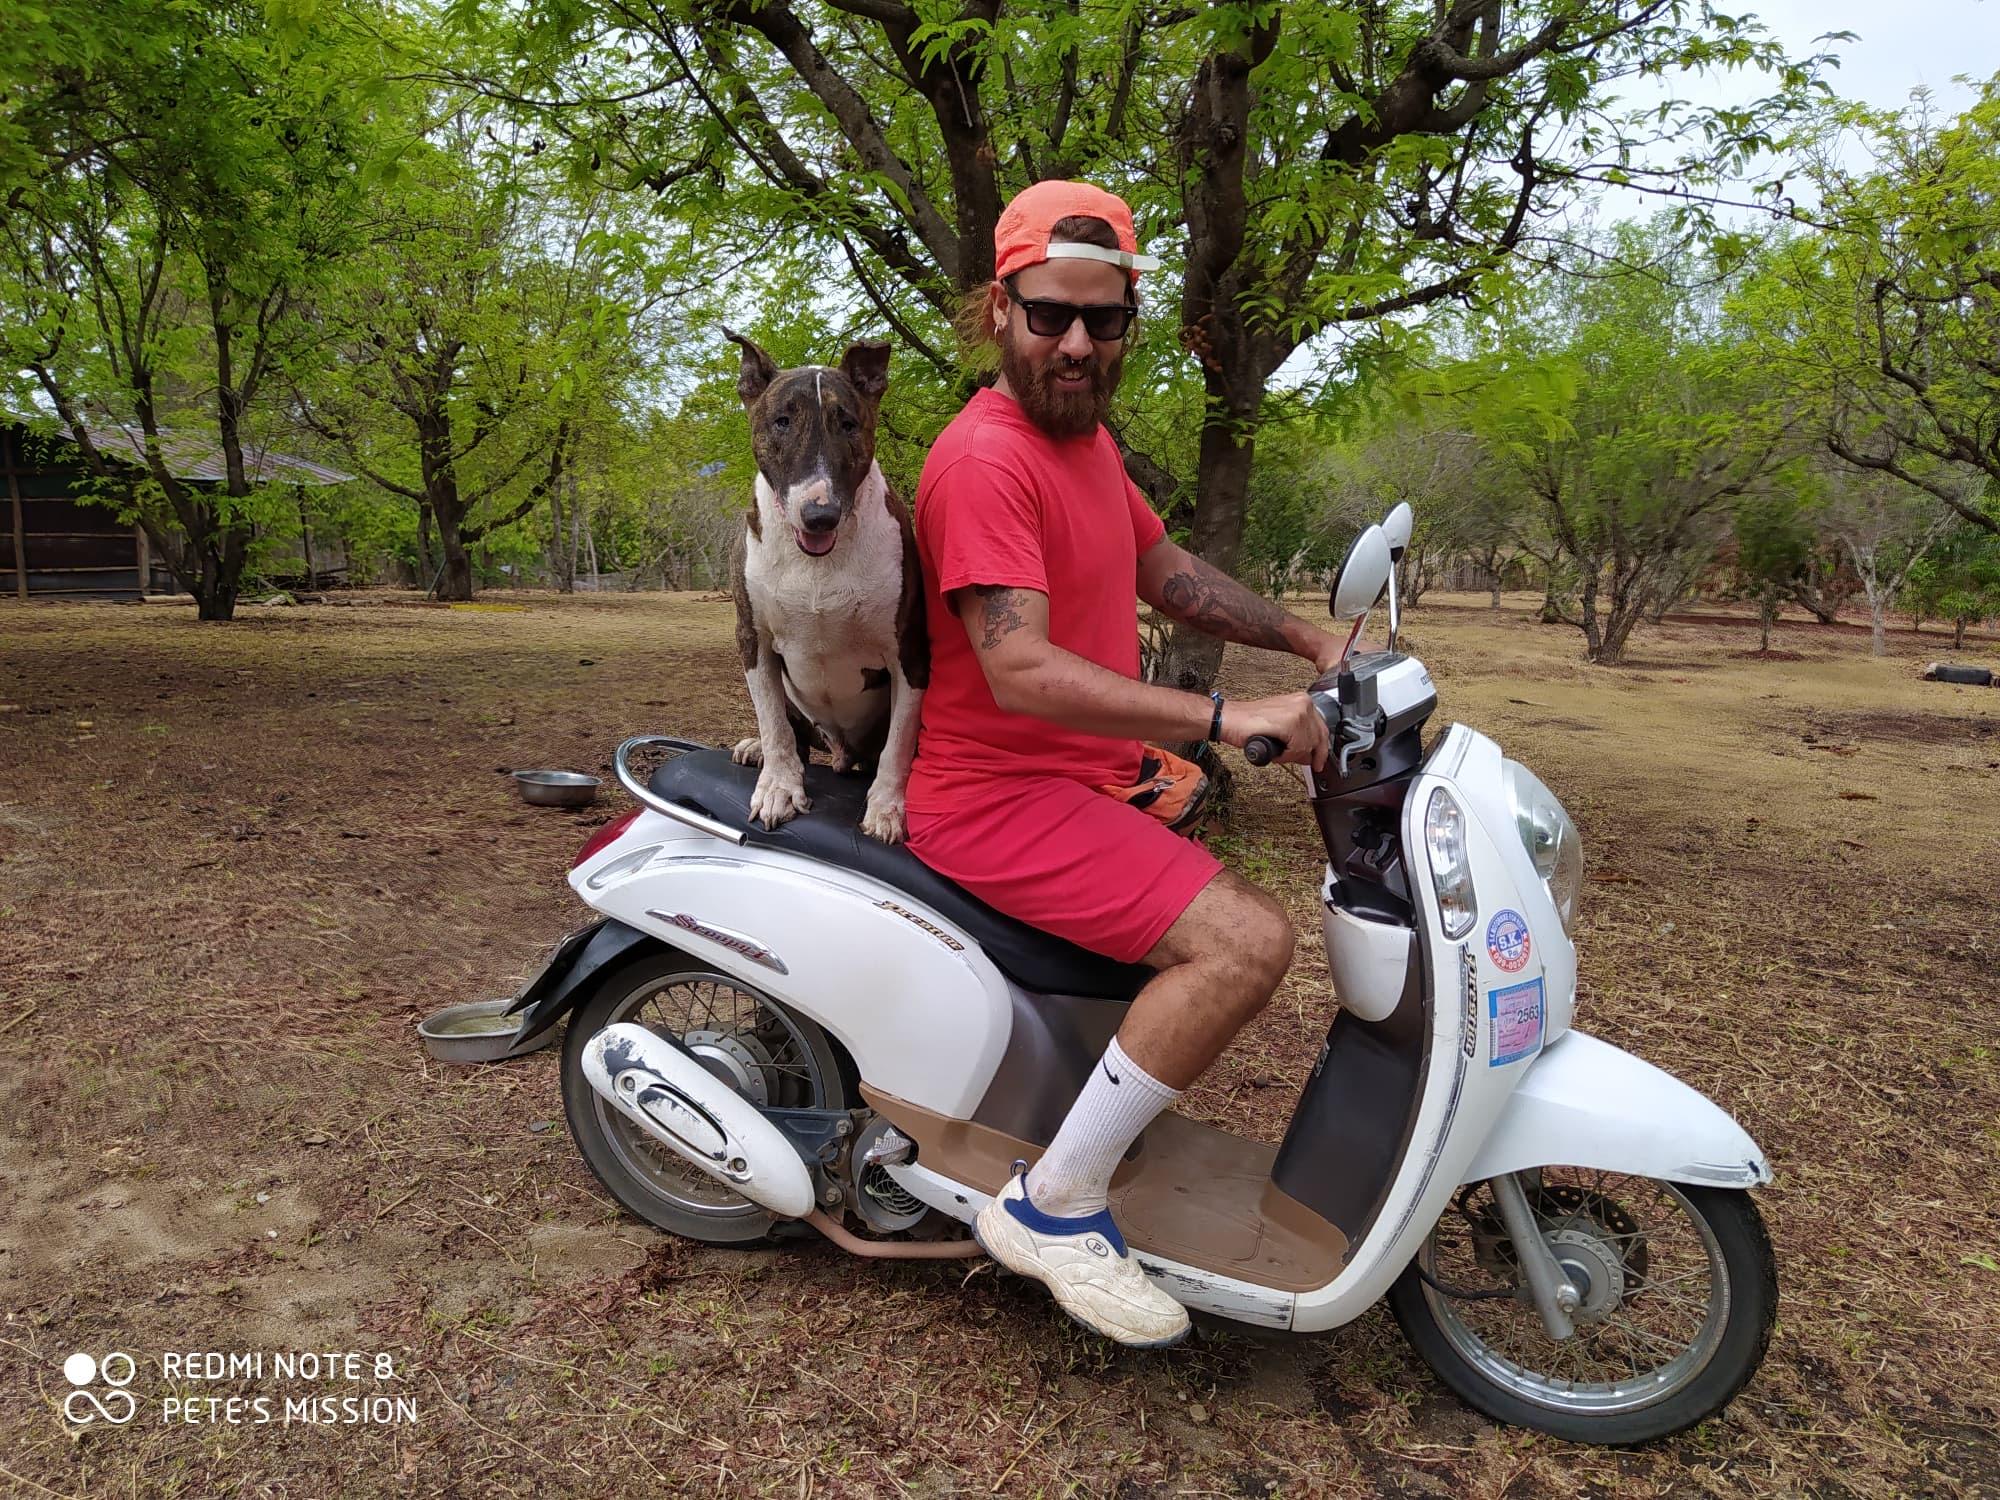 The Biker Dog